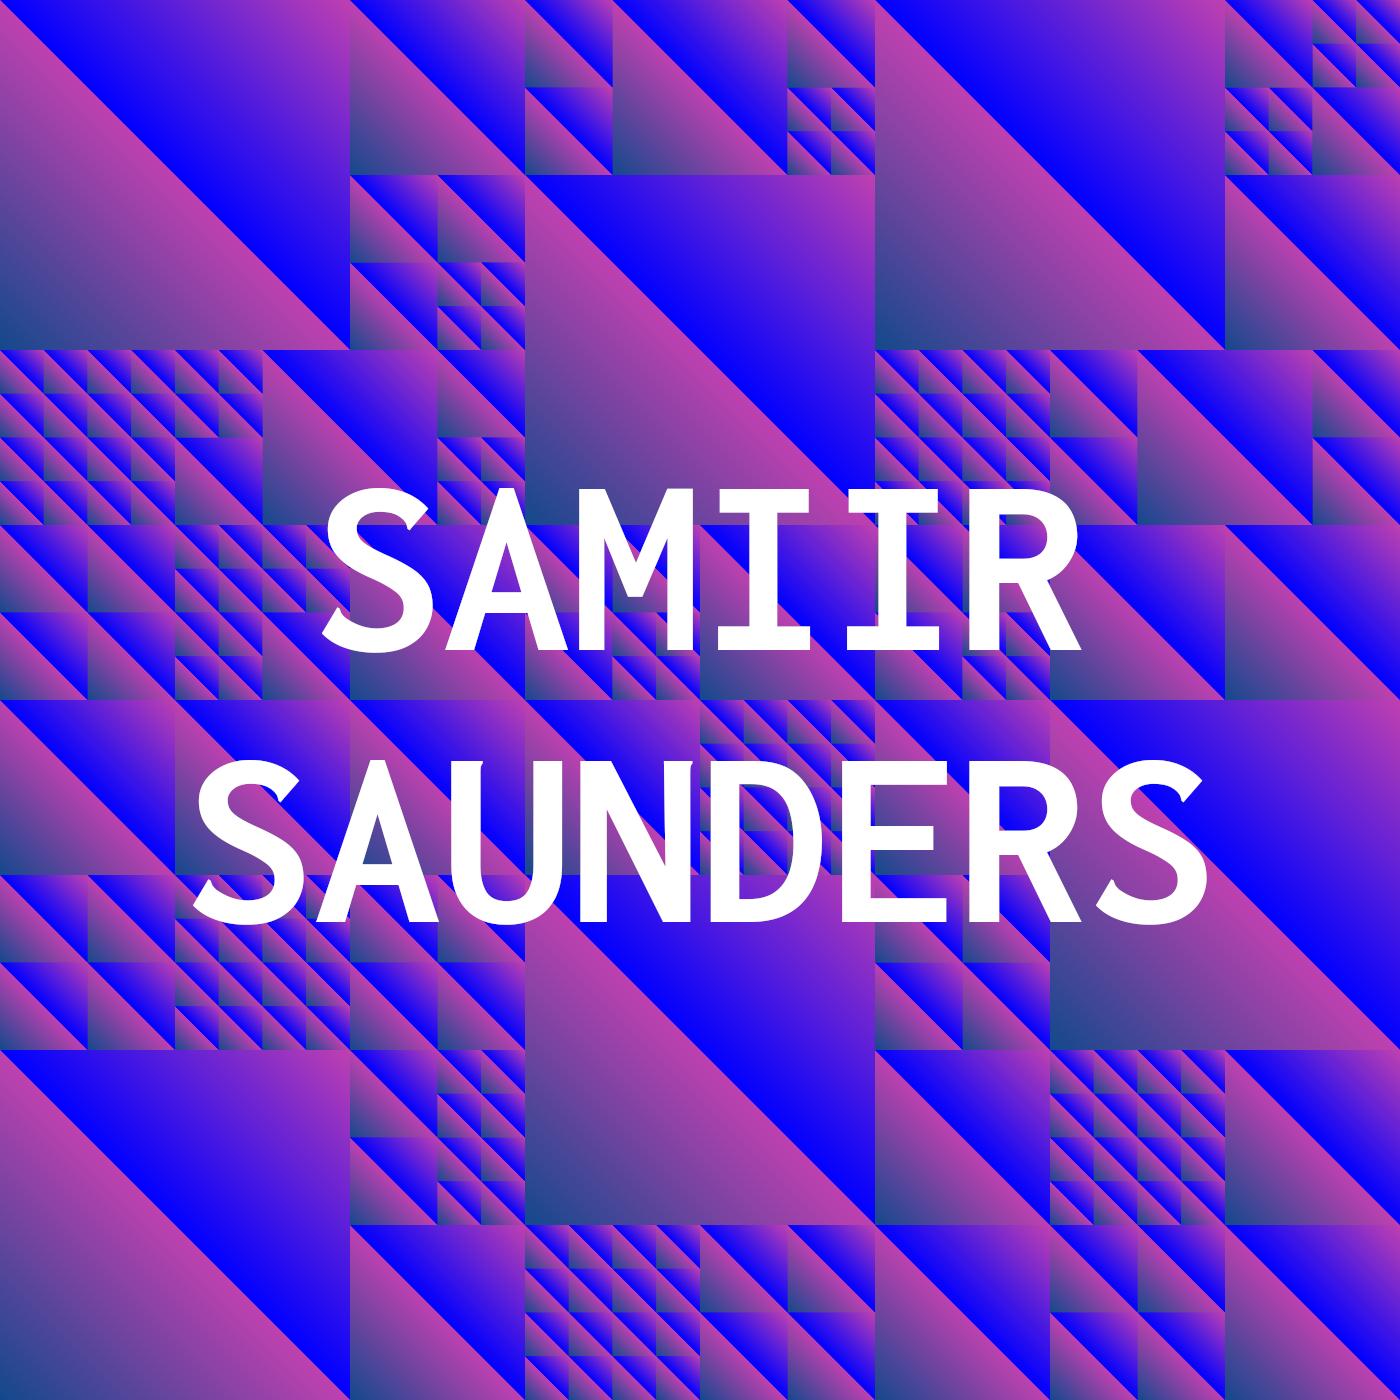 samiir_saunders